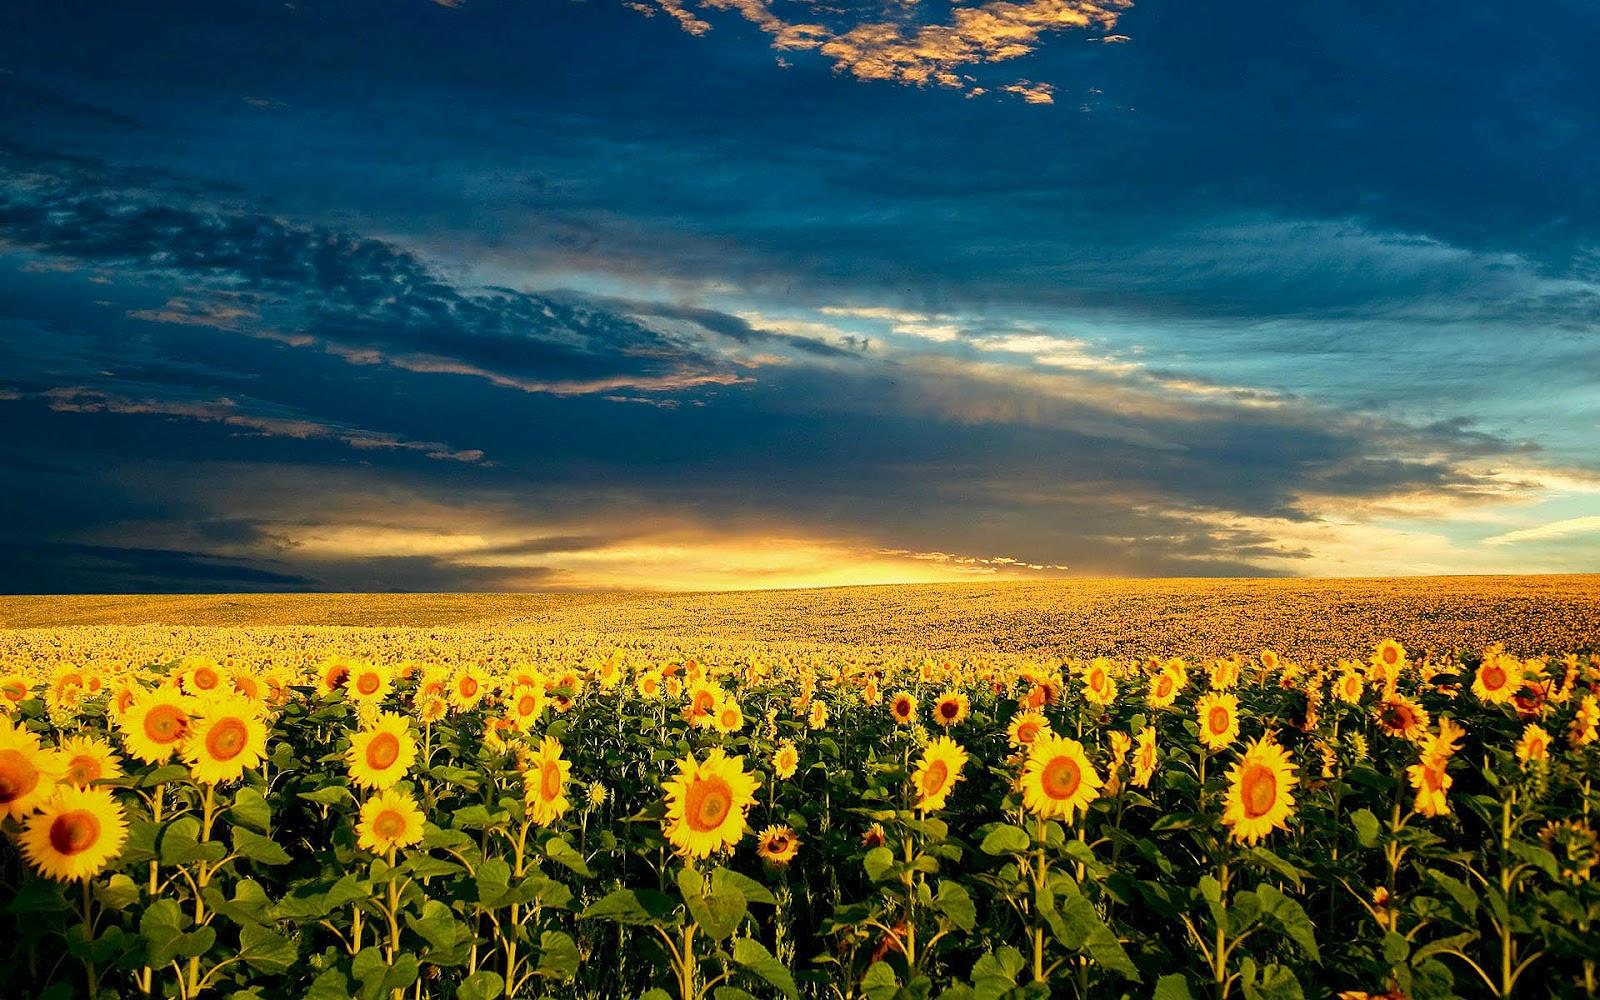 sunflower 8 wallpaper 1920x1080 - photo #46